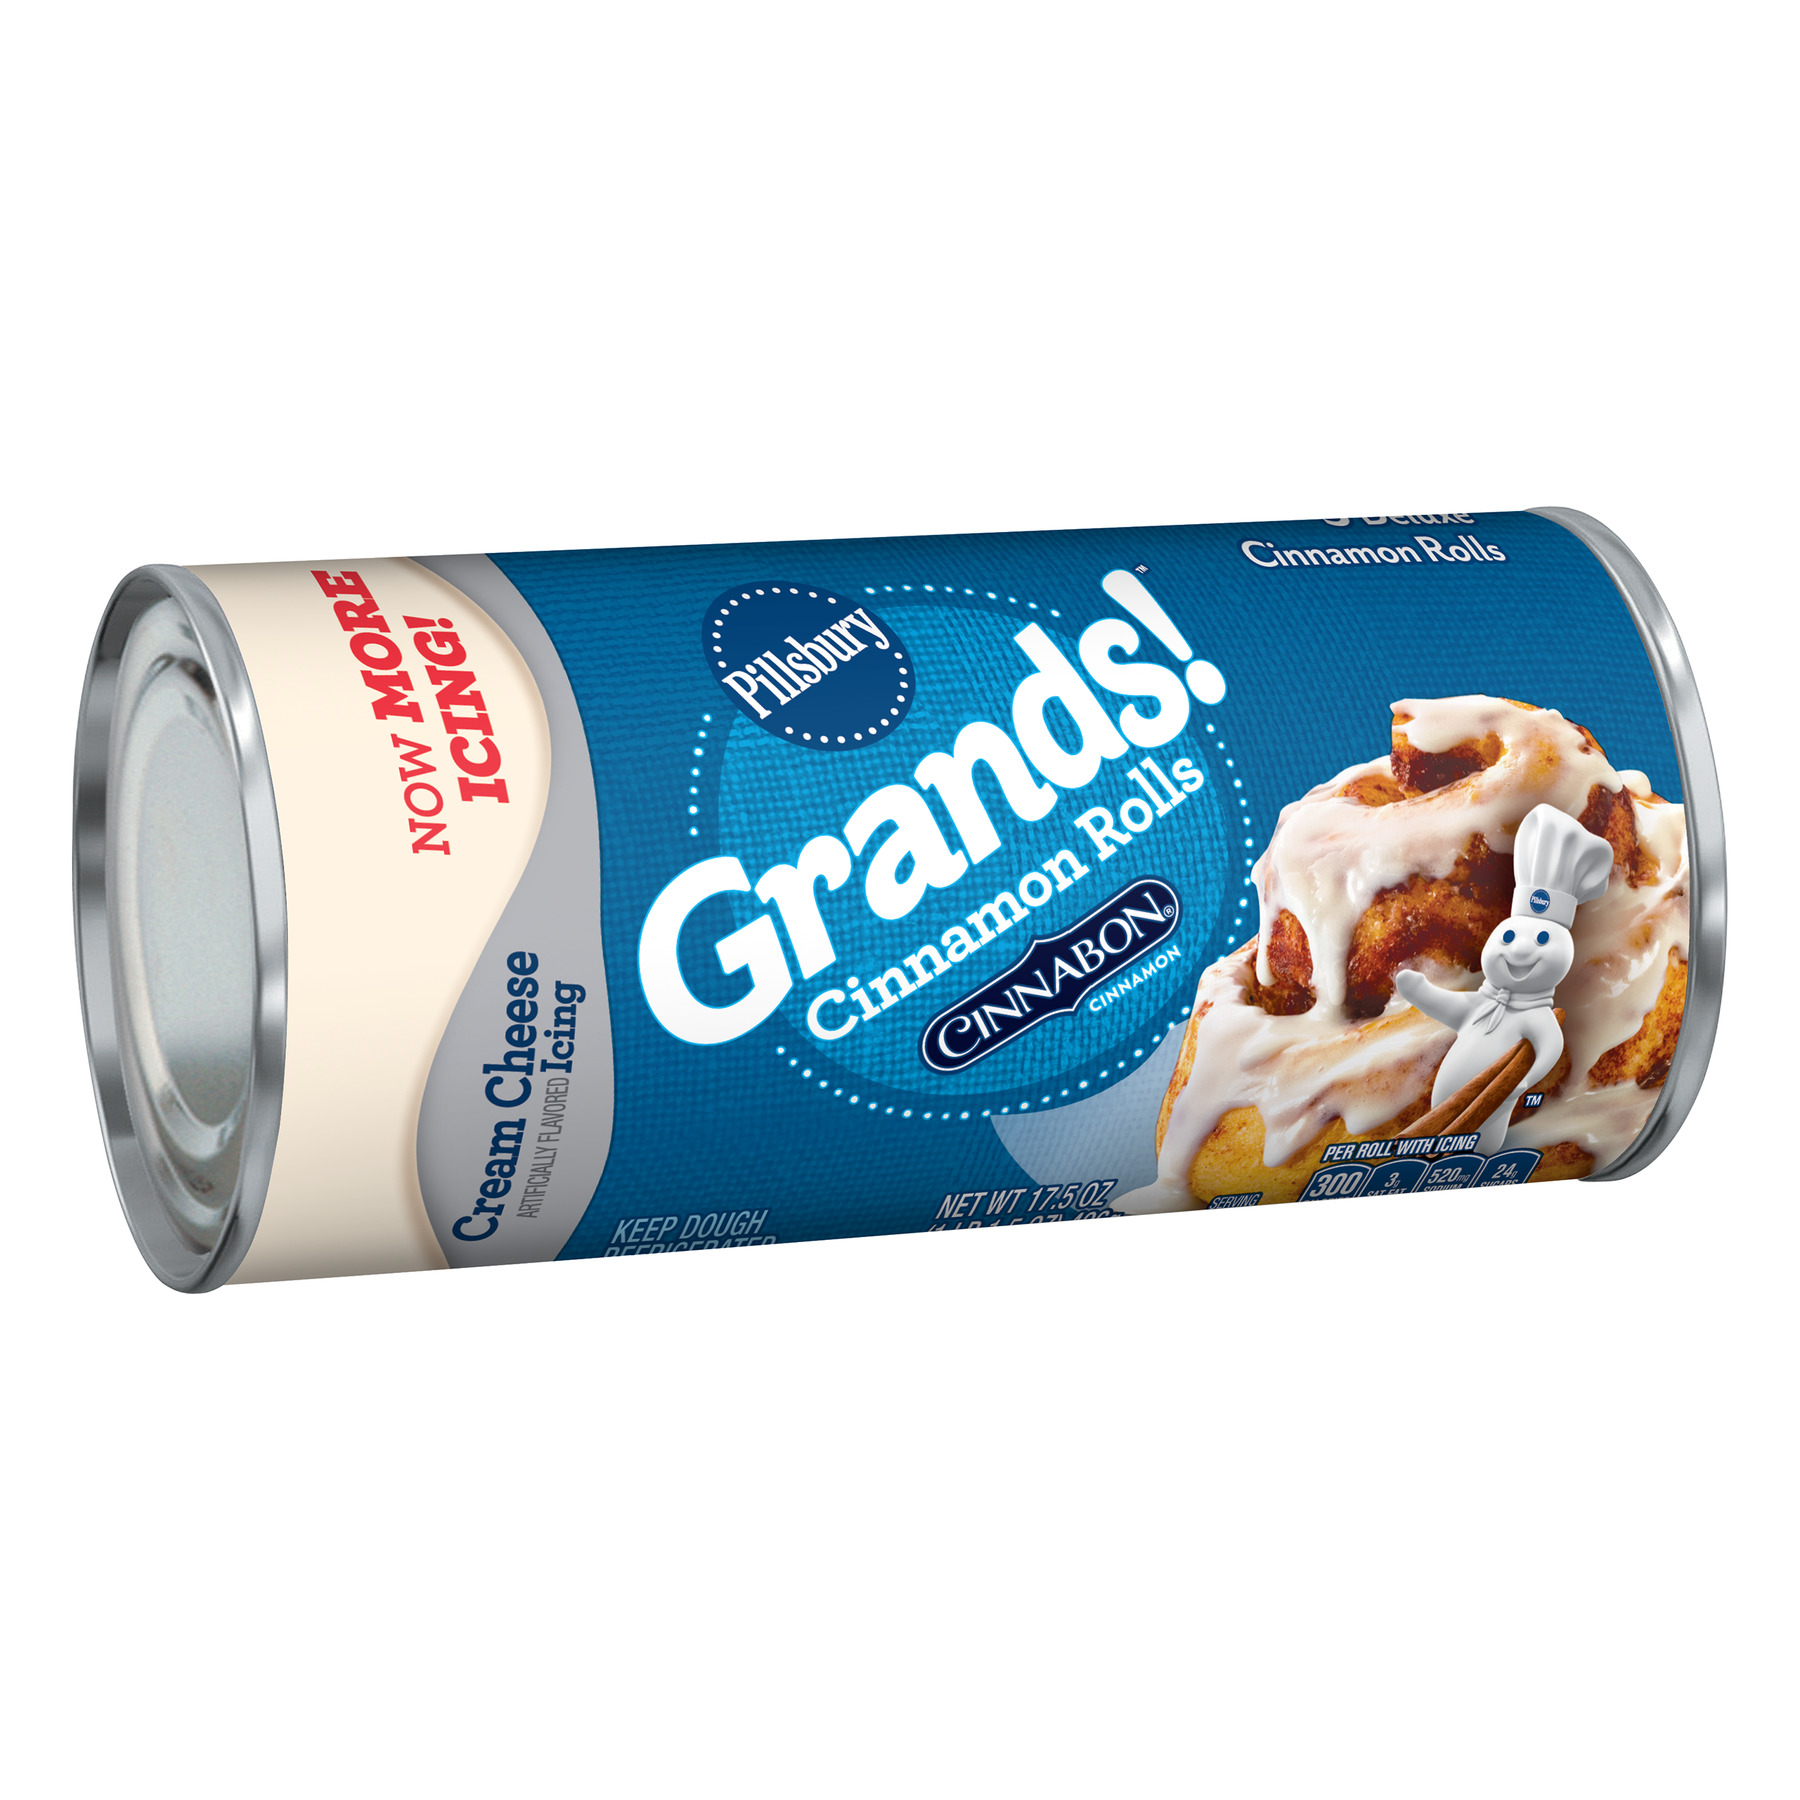 Pillsbury Grands! Cinnamon Rolls With Cream Cheese Icing 5 Ct 17.5 oz